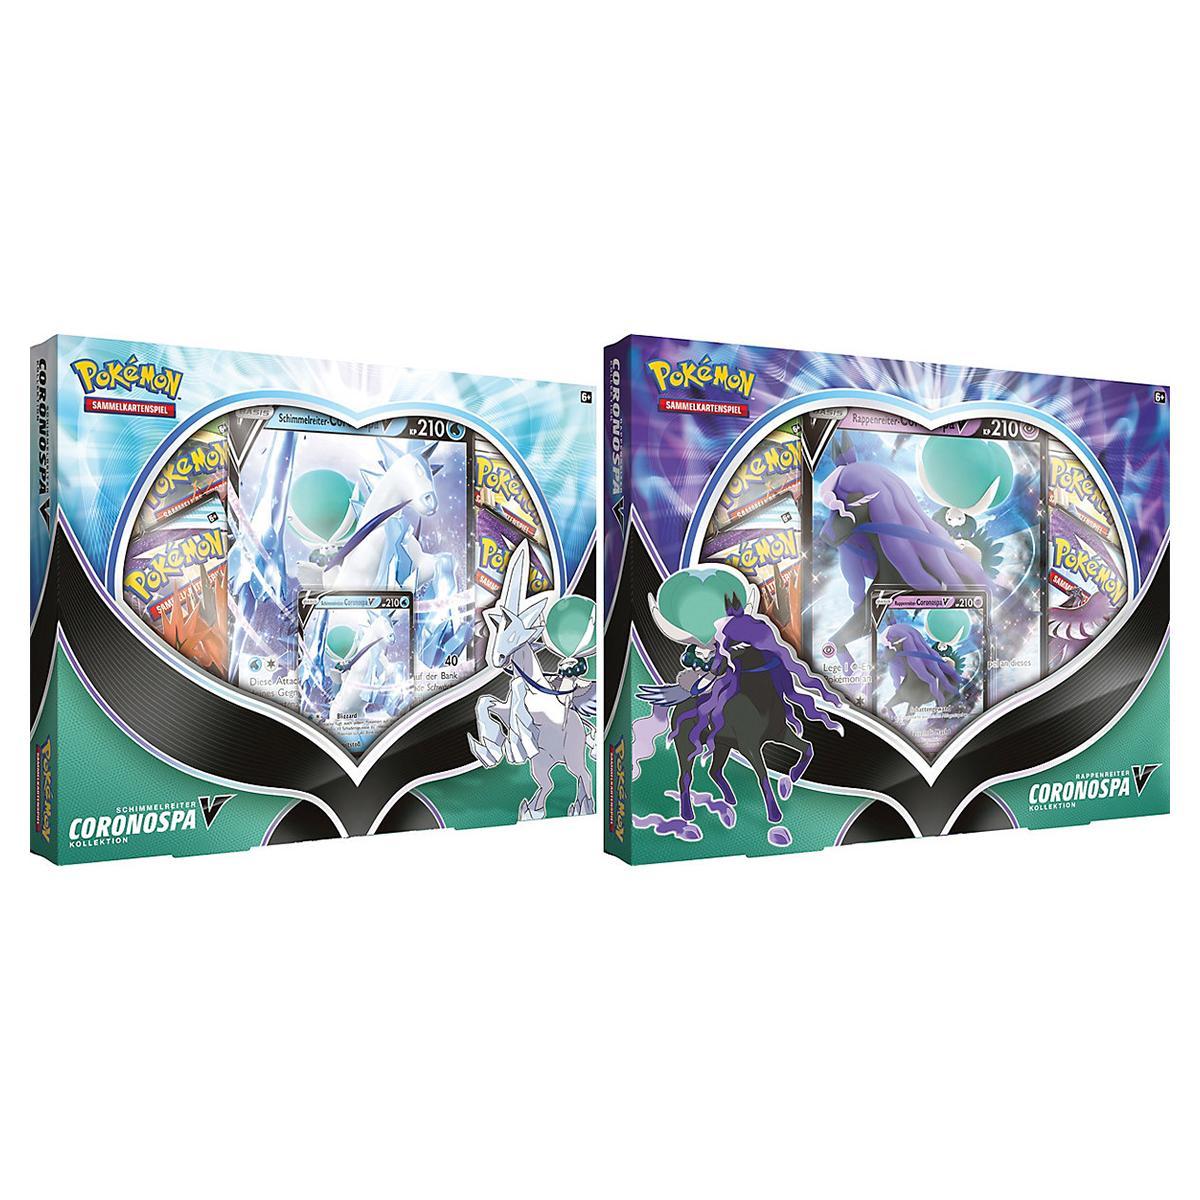 Pokémon Coronospa V Kollektion DE